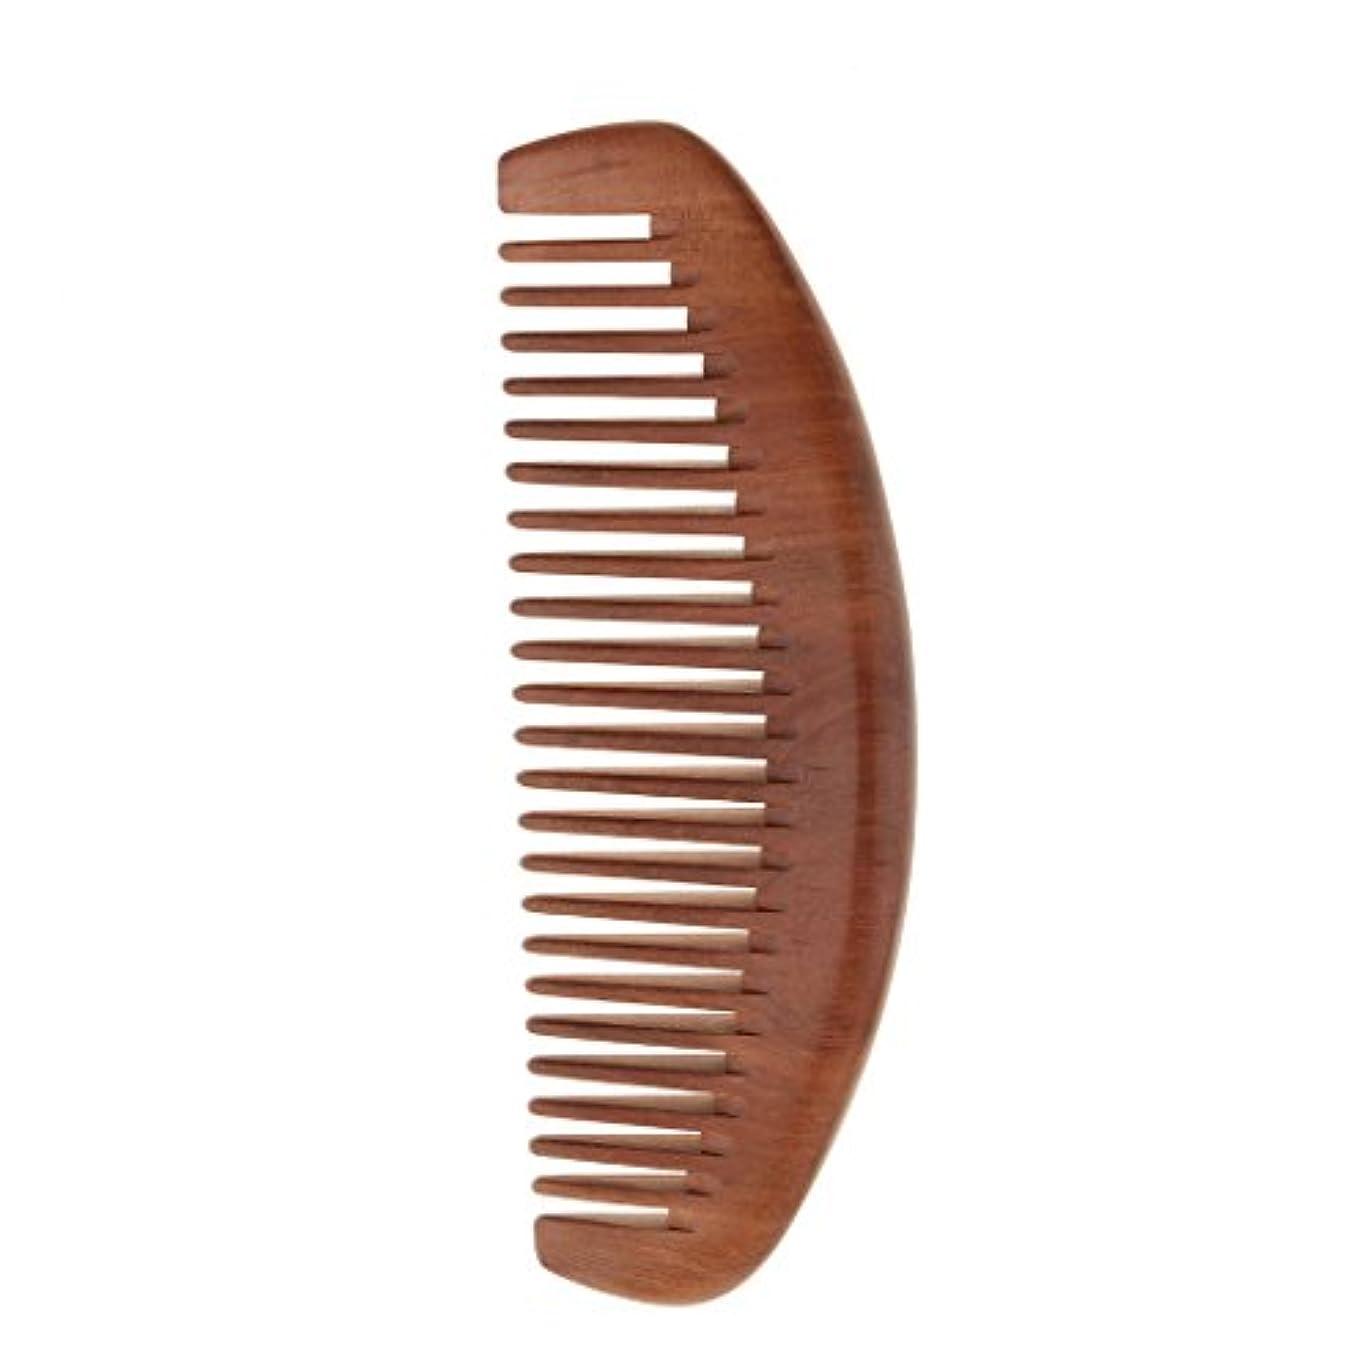 DYNWAVE 櫛 セットコーム 木製 ヘアコーム ヘアケア 頭皮マッサージ 静電気防止 桃の木 全2種類 - ワイド歯